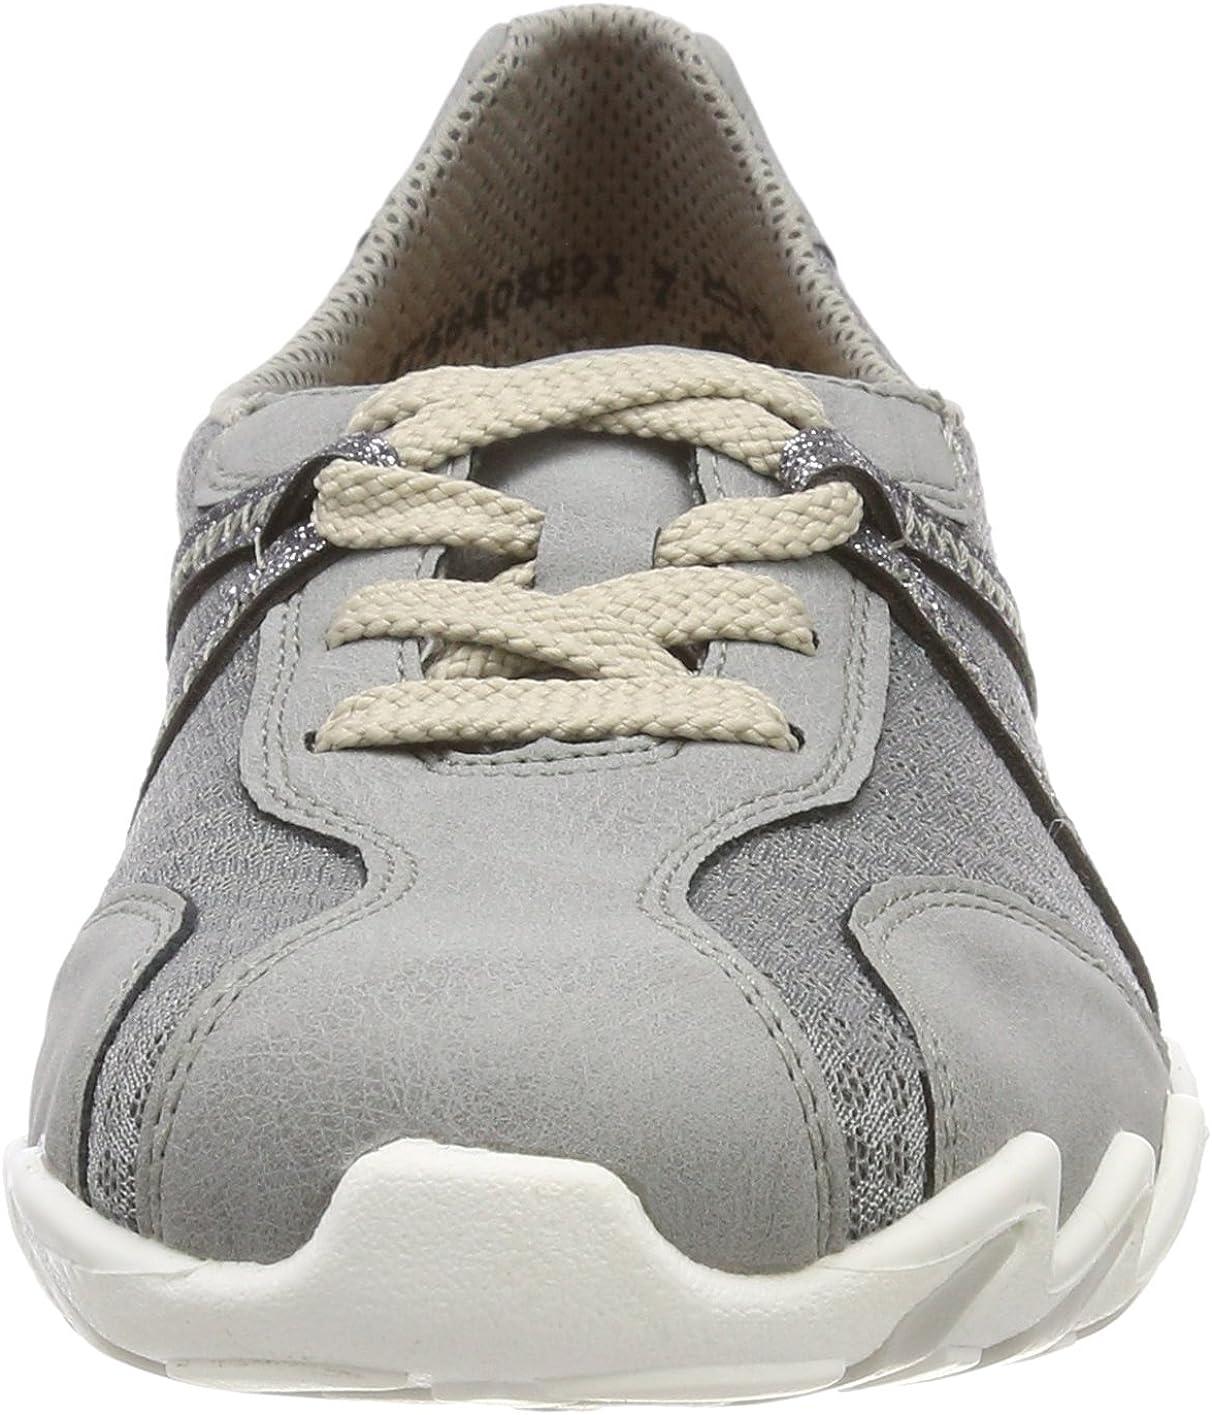 Rieker 49020, Sneakers Basses Femme Gris Staub Cenere Altsilber